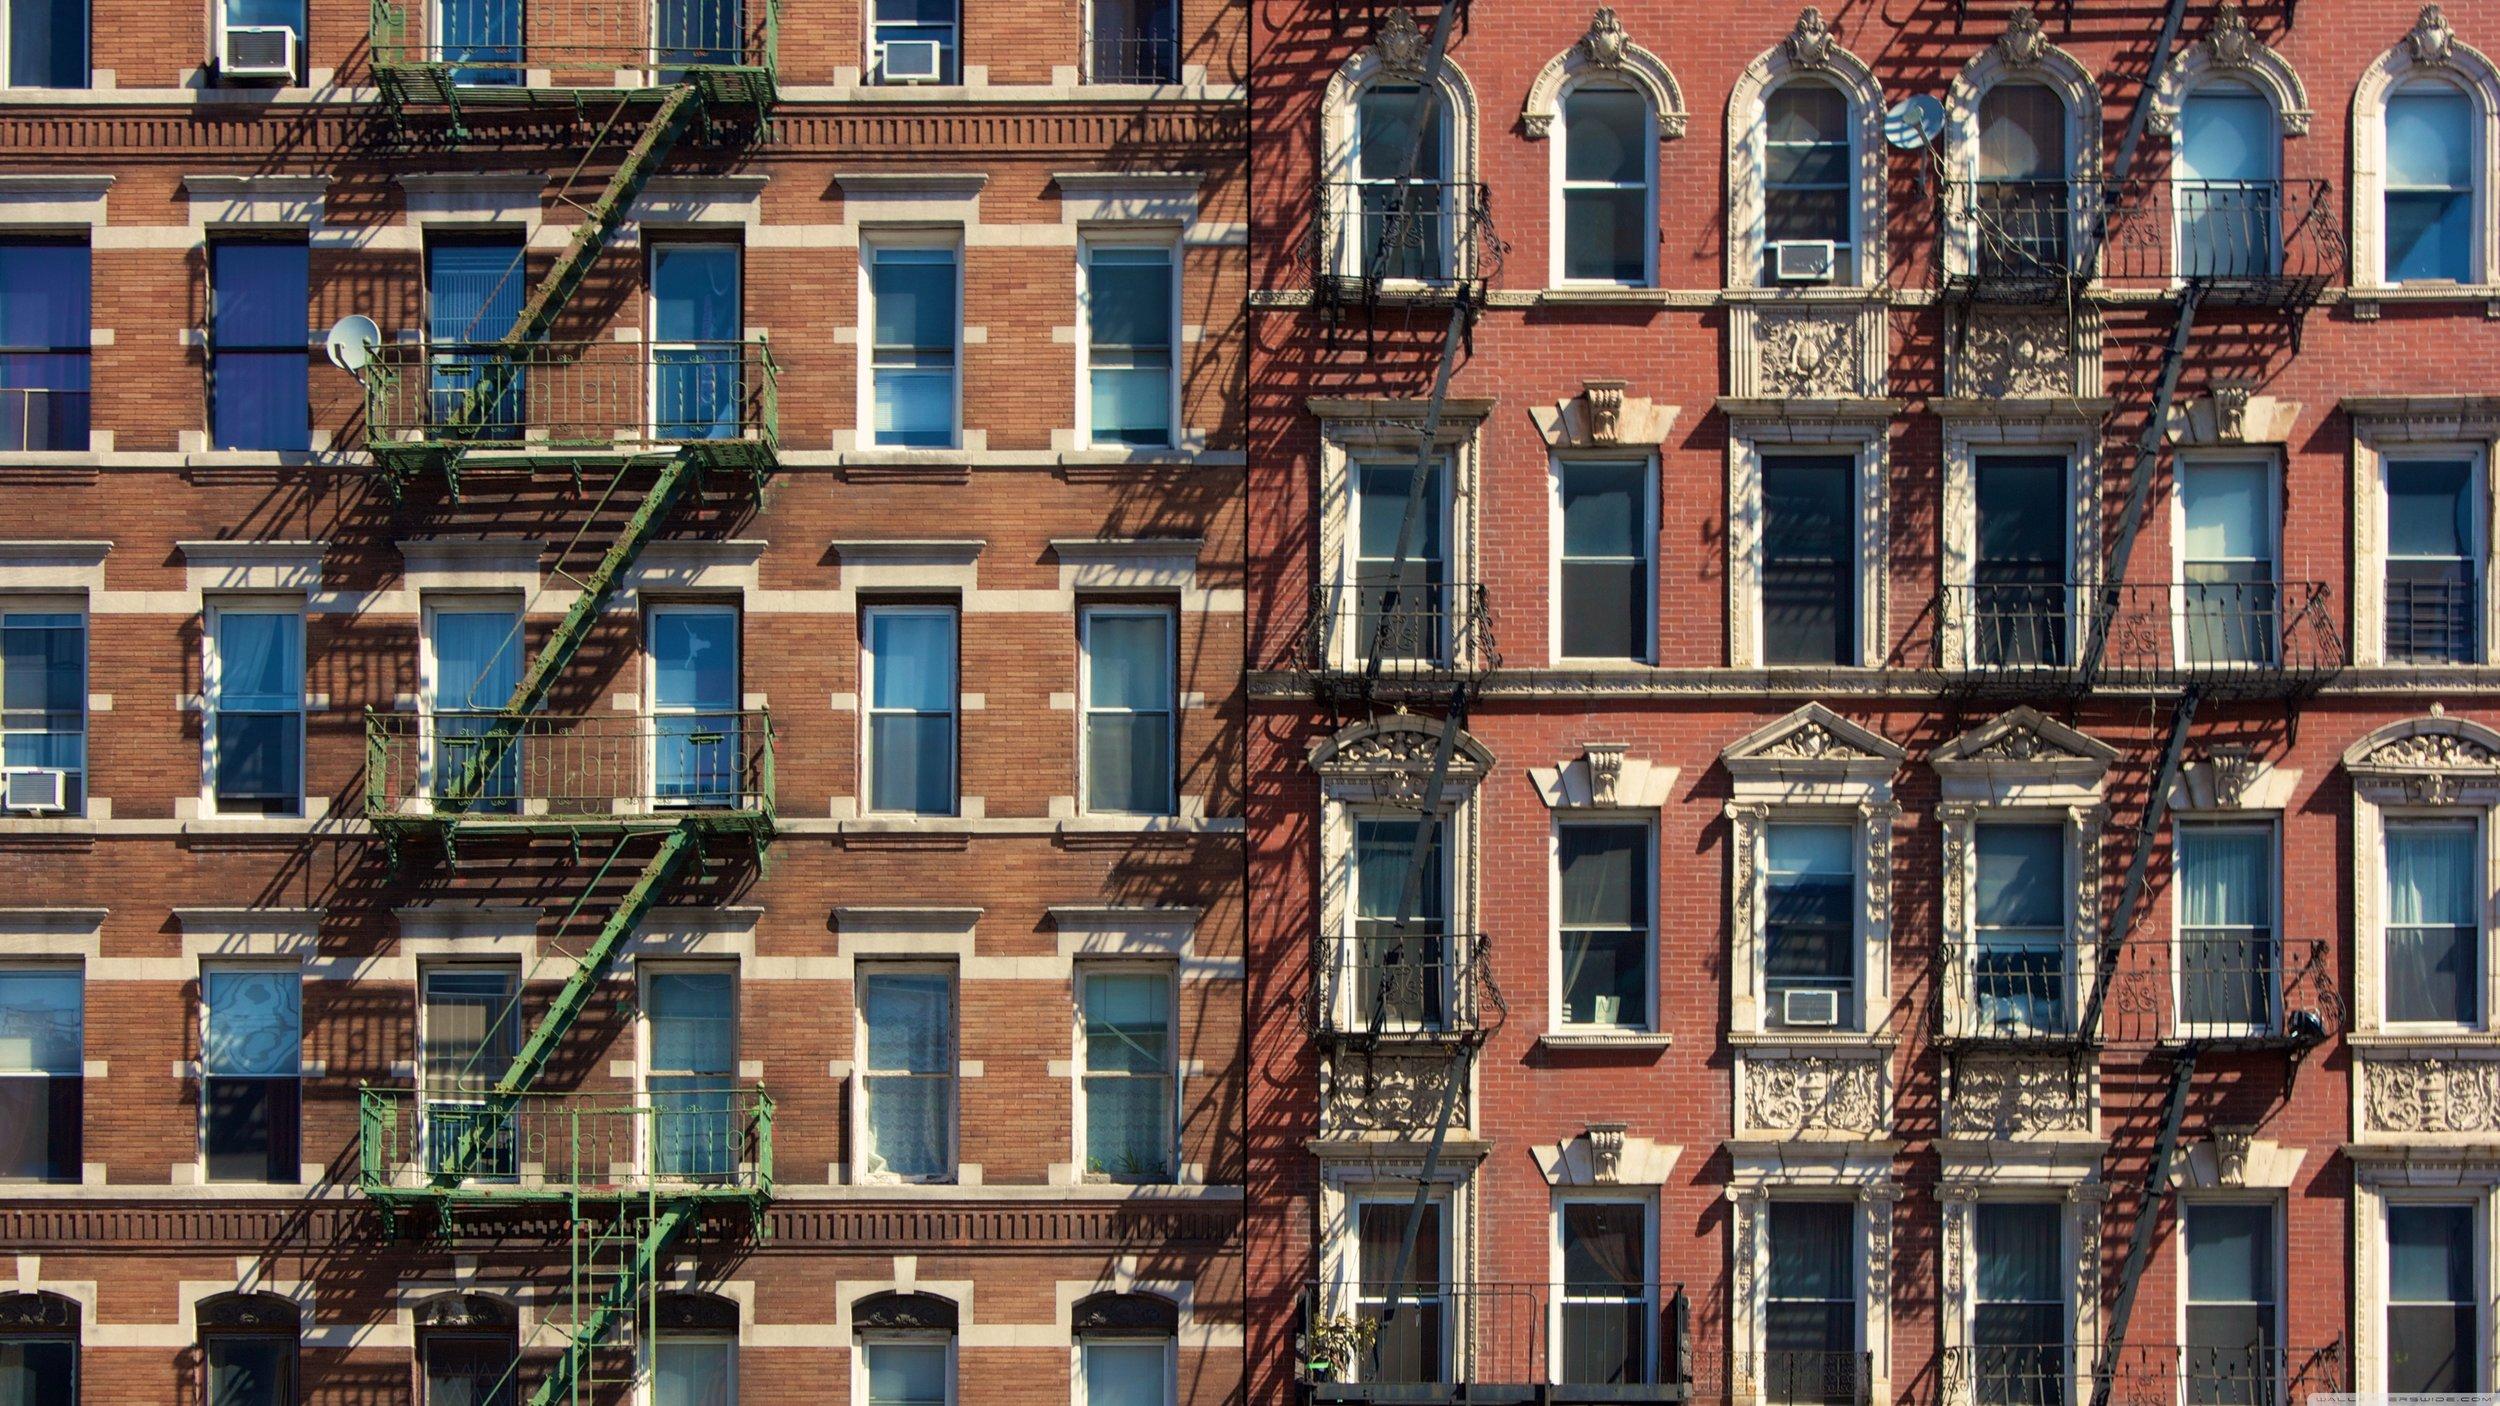 bricks_and_fire_escapes-wallpaper-5120x2880.jpg